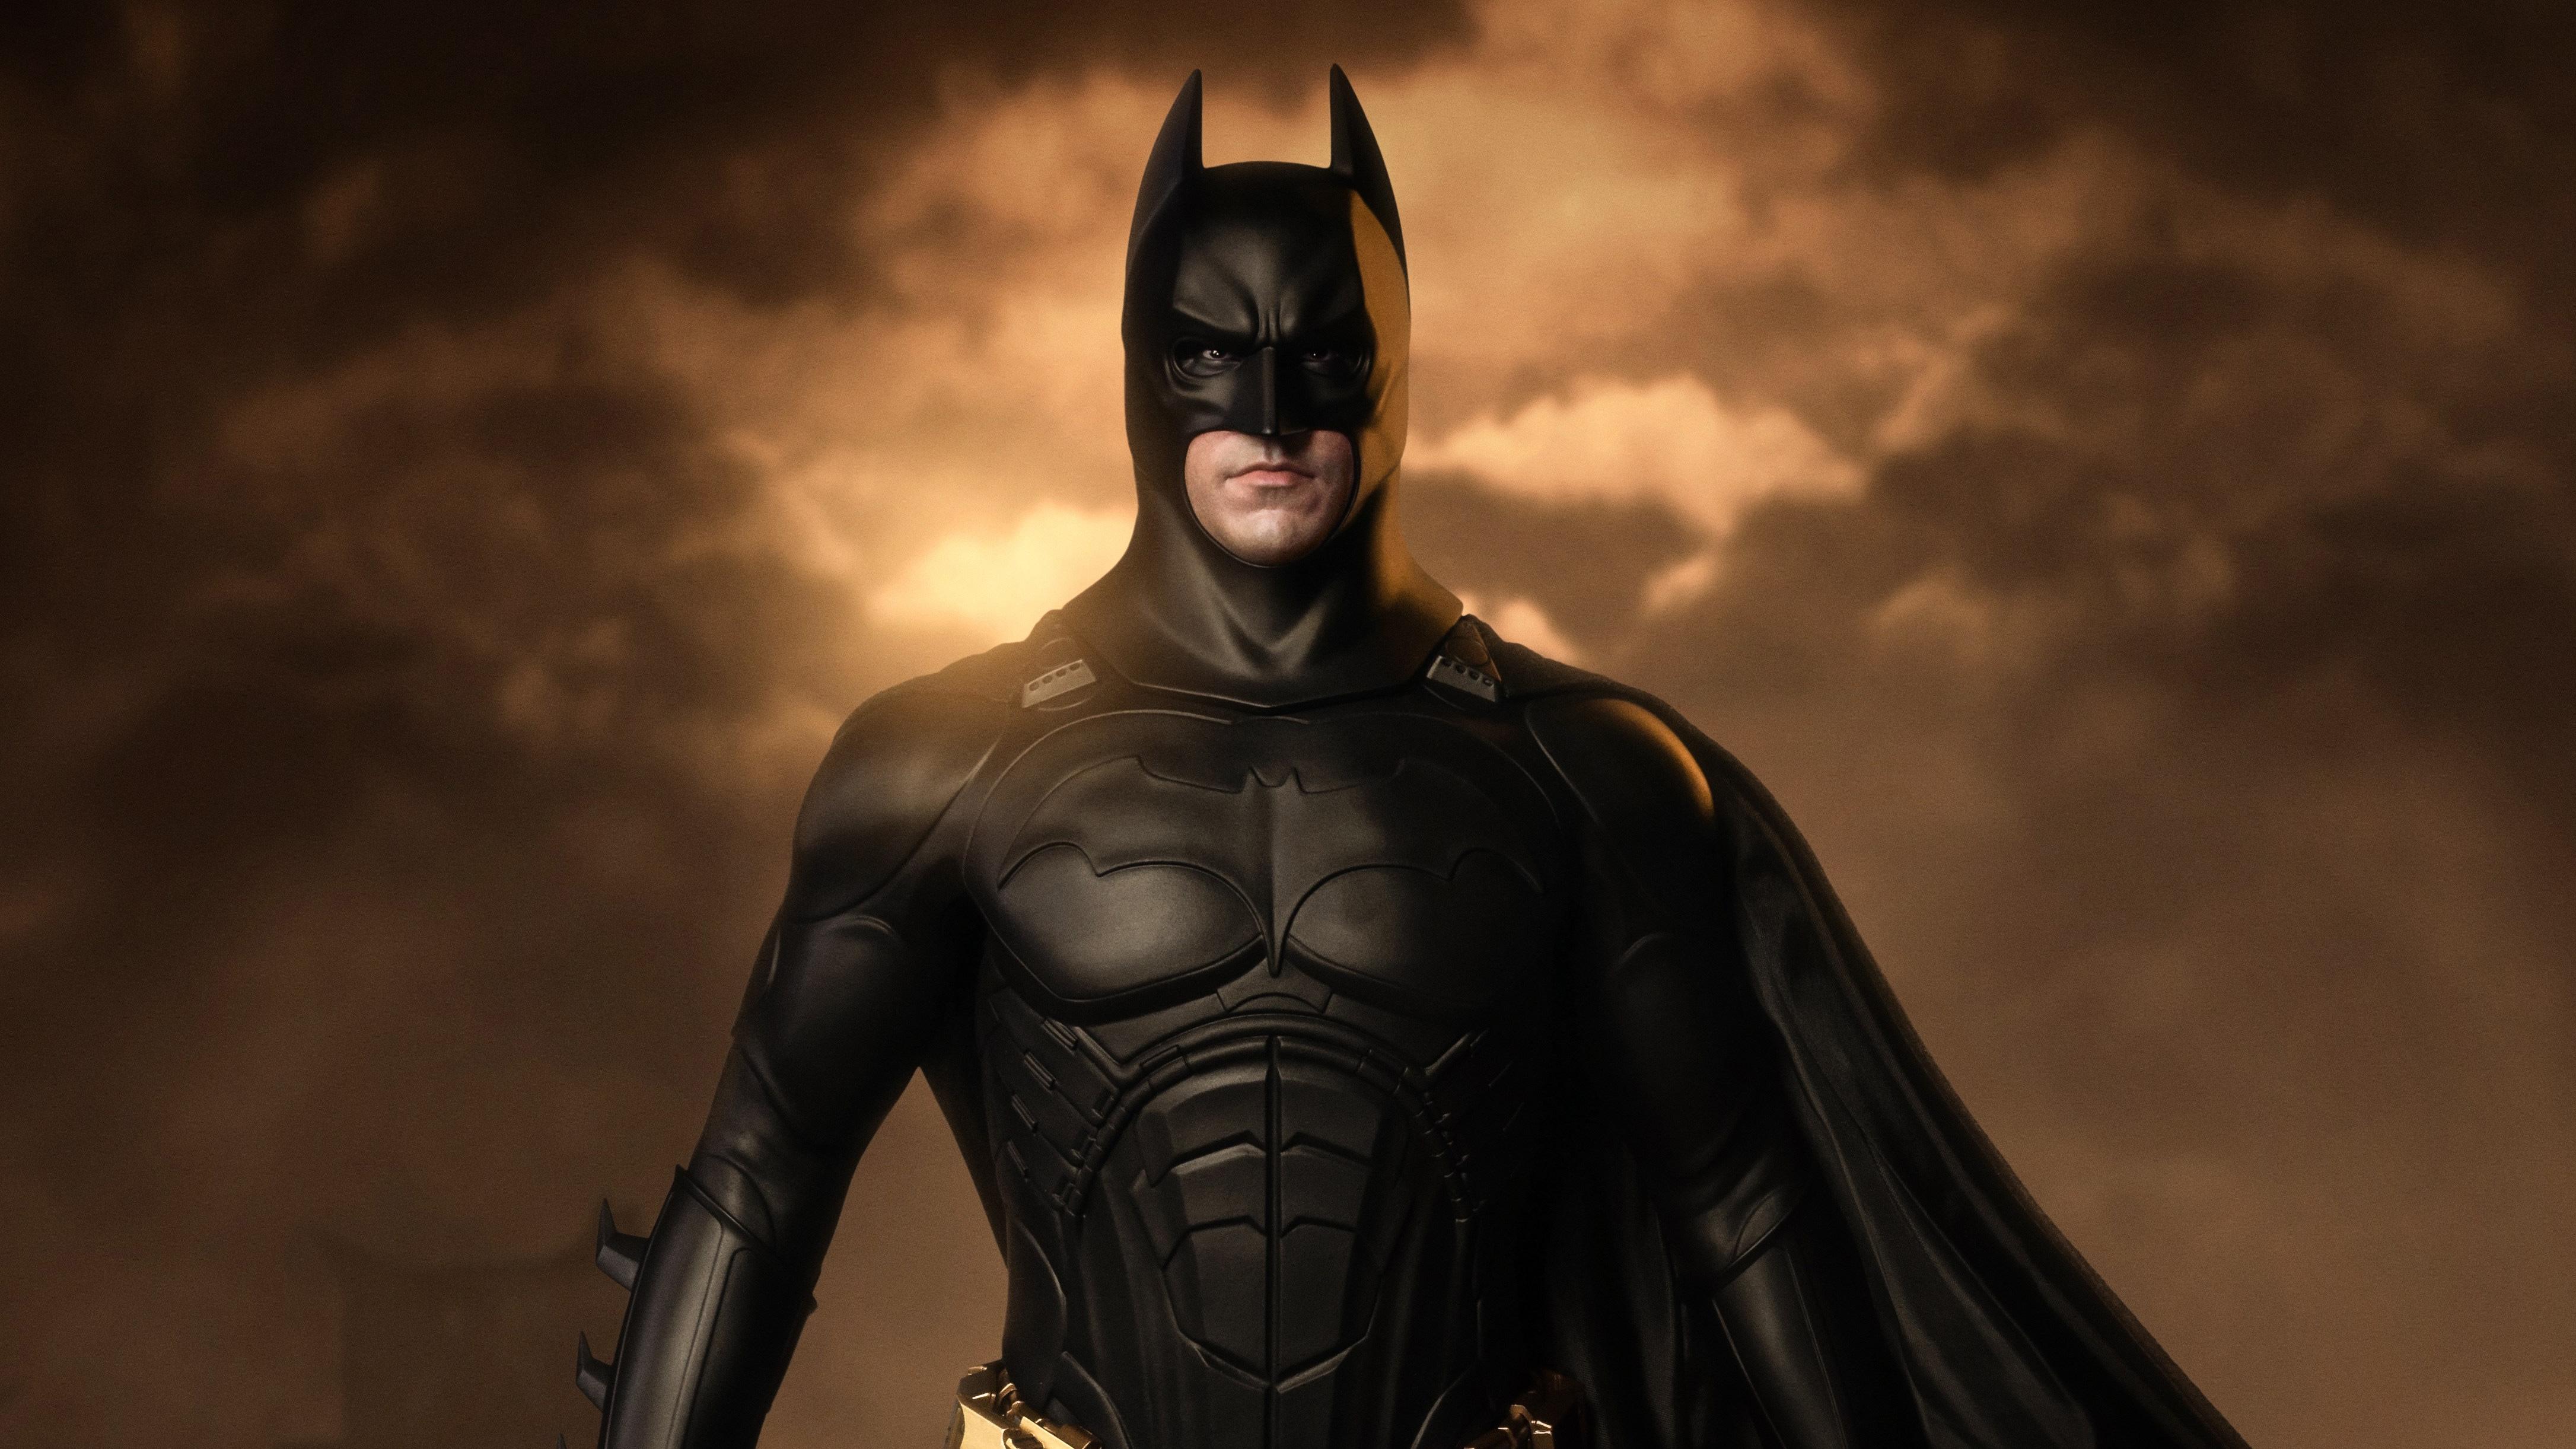 Nolan Batman vs Raimi Spider-Man Batman-begins-4k-rn